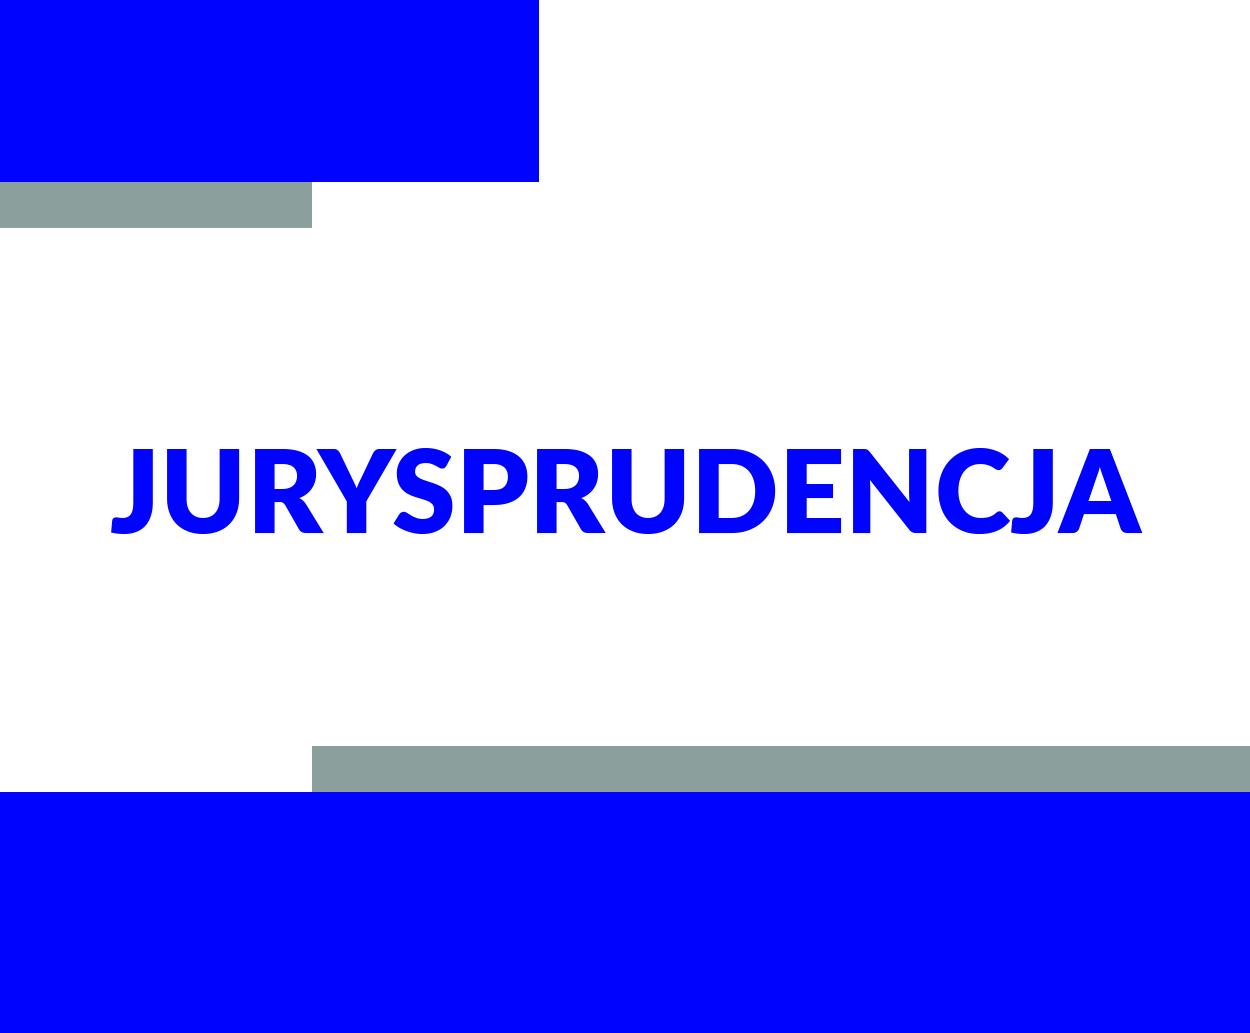 jurysprudencja_300_cmyk